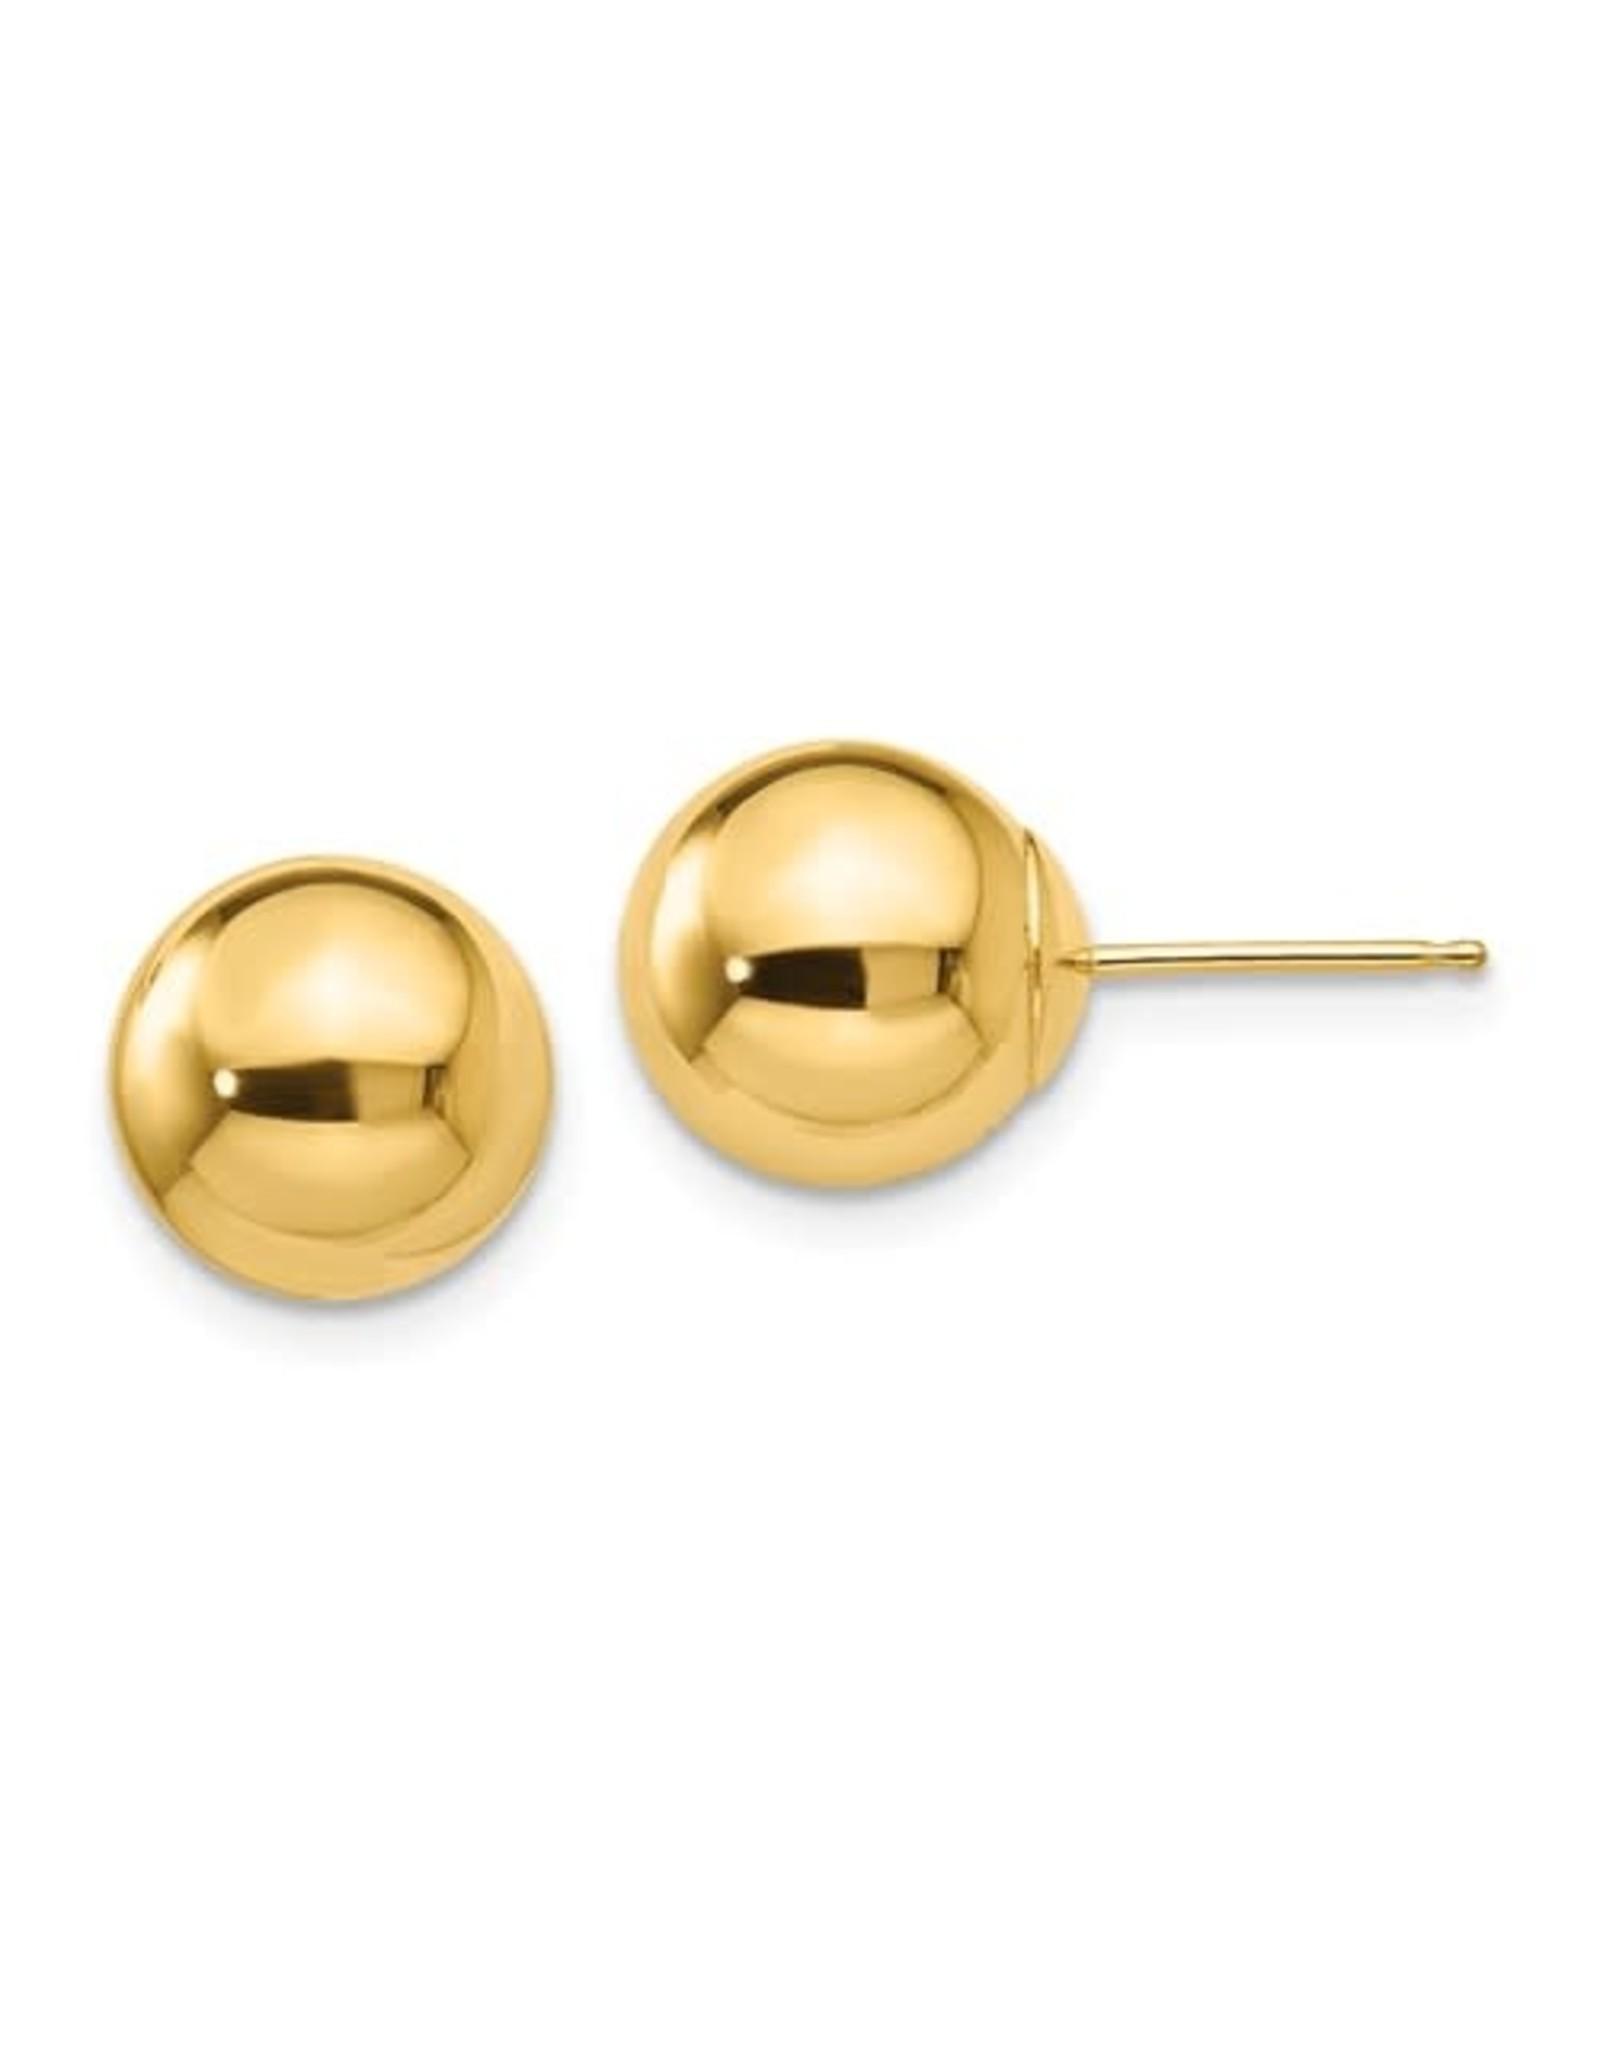 14K Yellow Gold 7mm Ball Stud Earrings